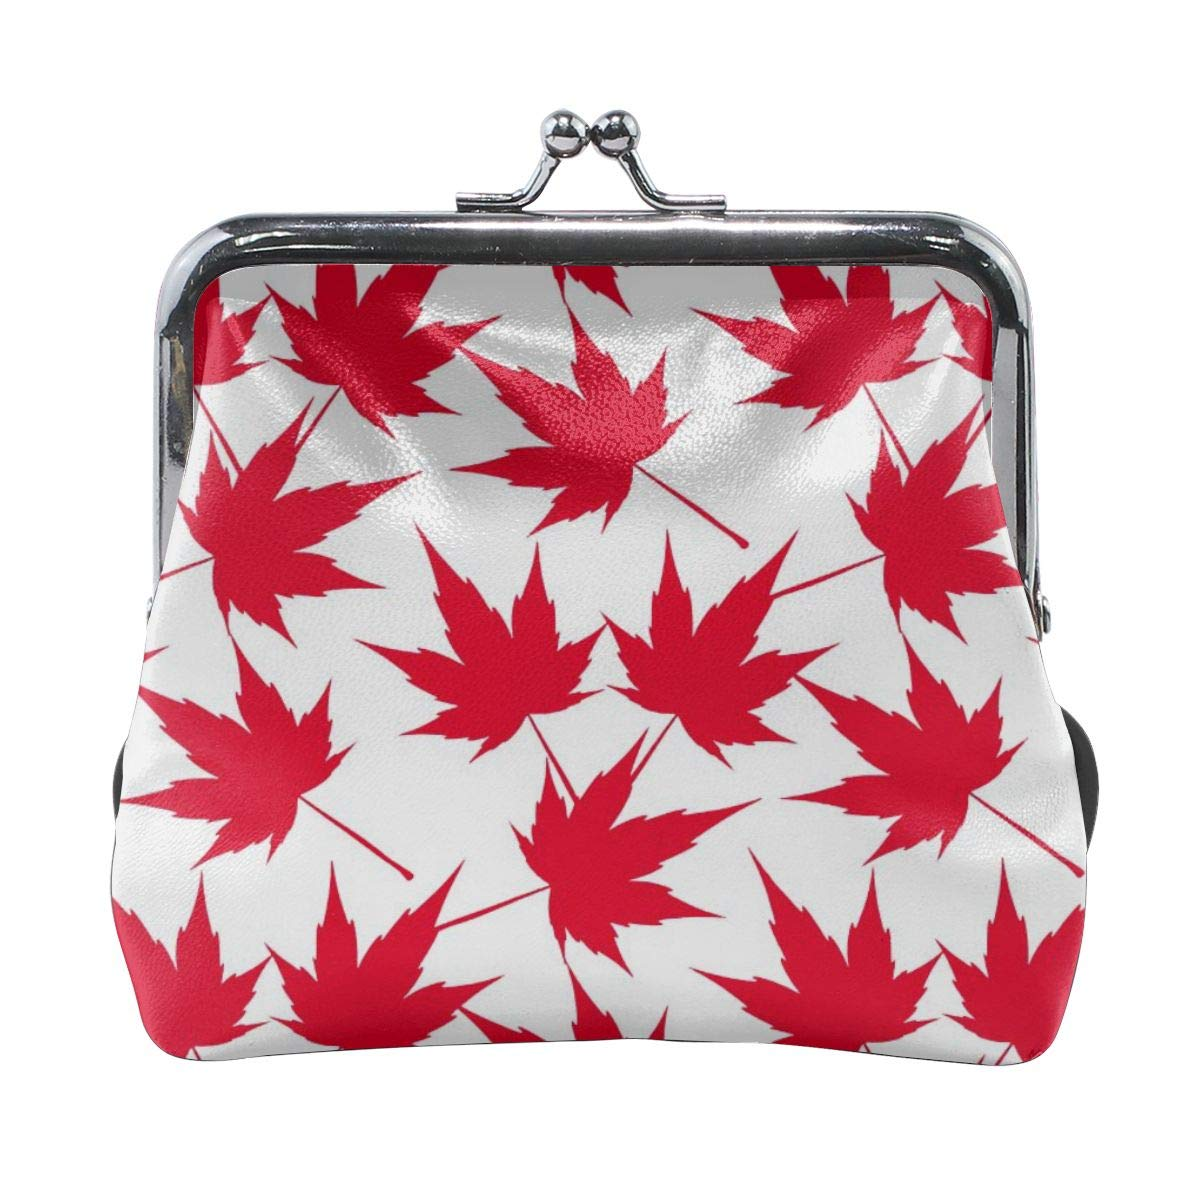 Canadian Maple Leaf Pattern Cute Buckle Coin Purses Buckle Buckle Change Purse Wallets